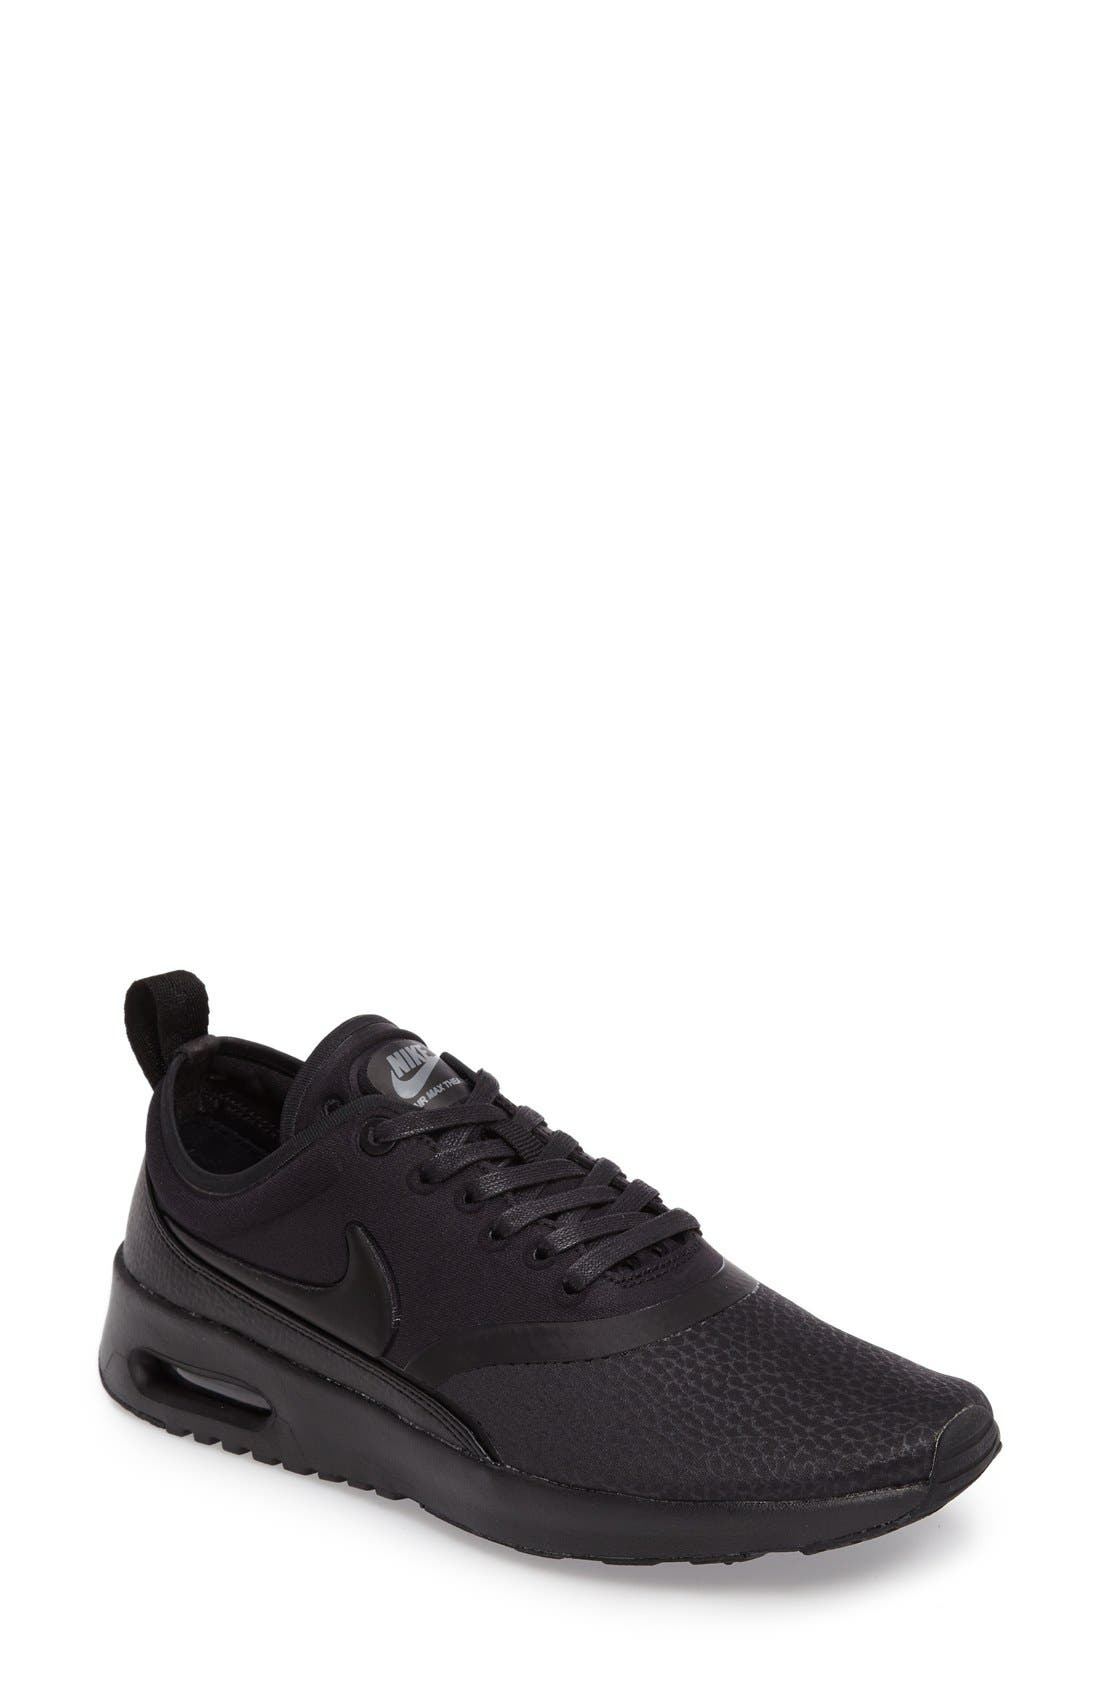 Air Max Thea Ultra Premium Sneaker,                             Main thumbnail 1, color,                             003